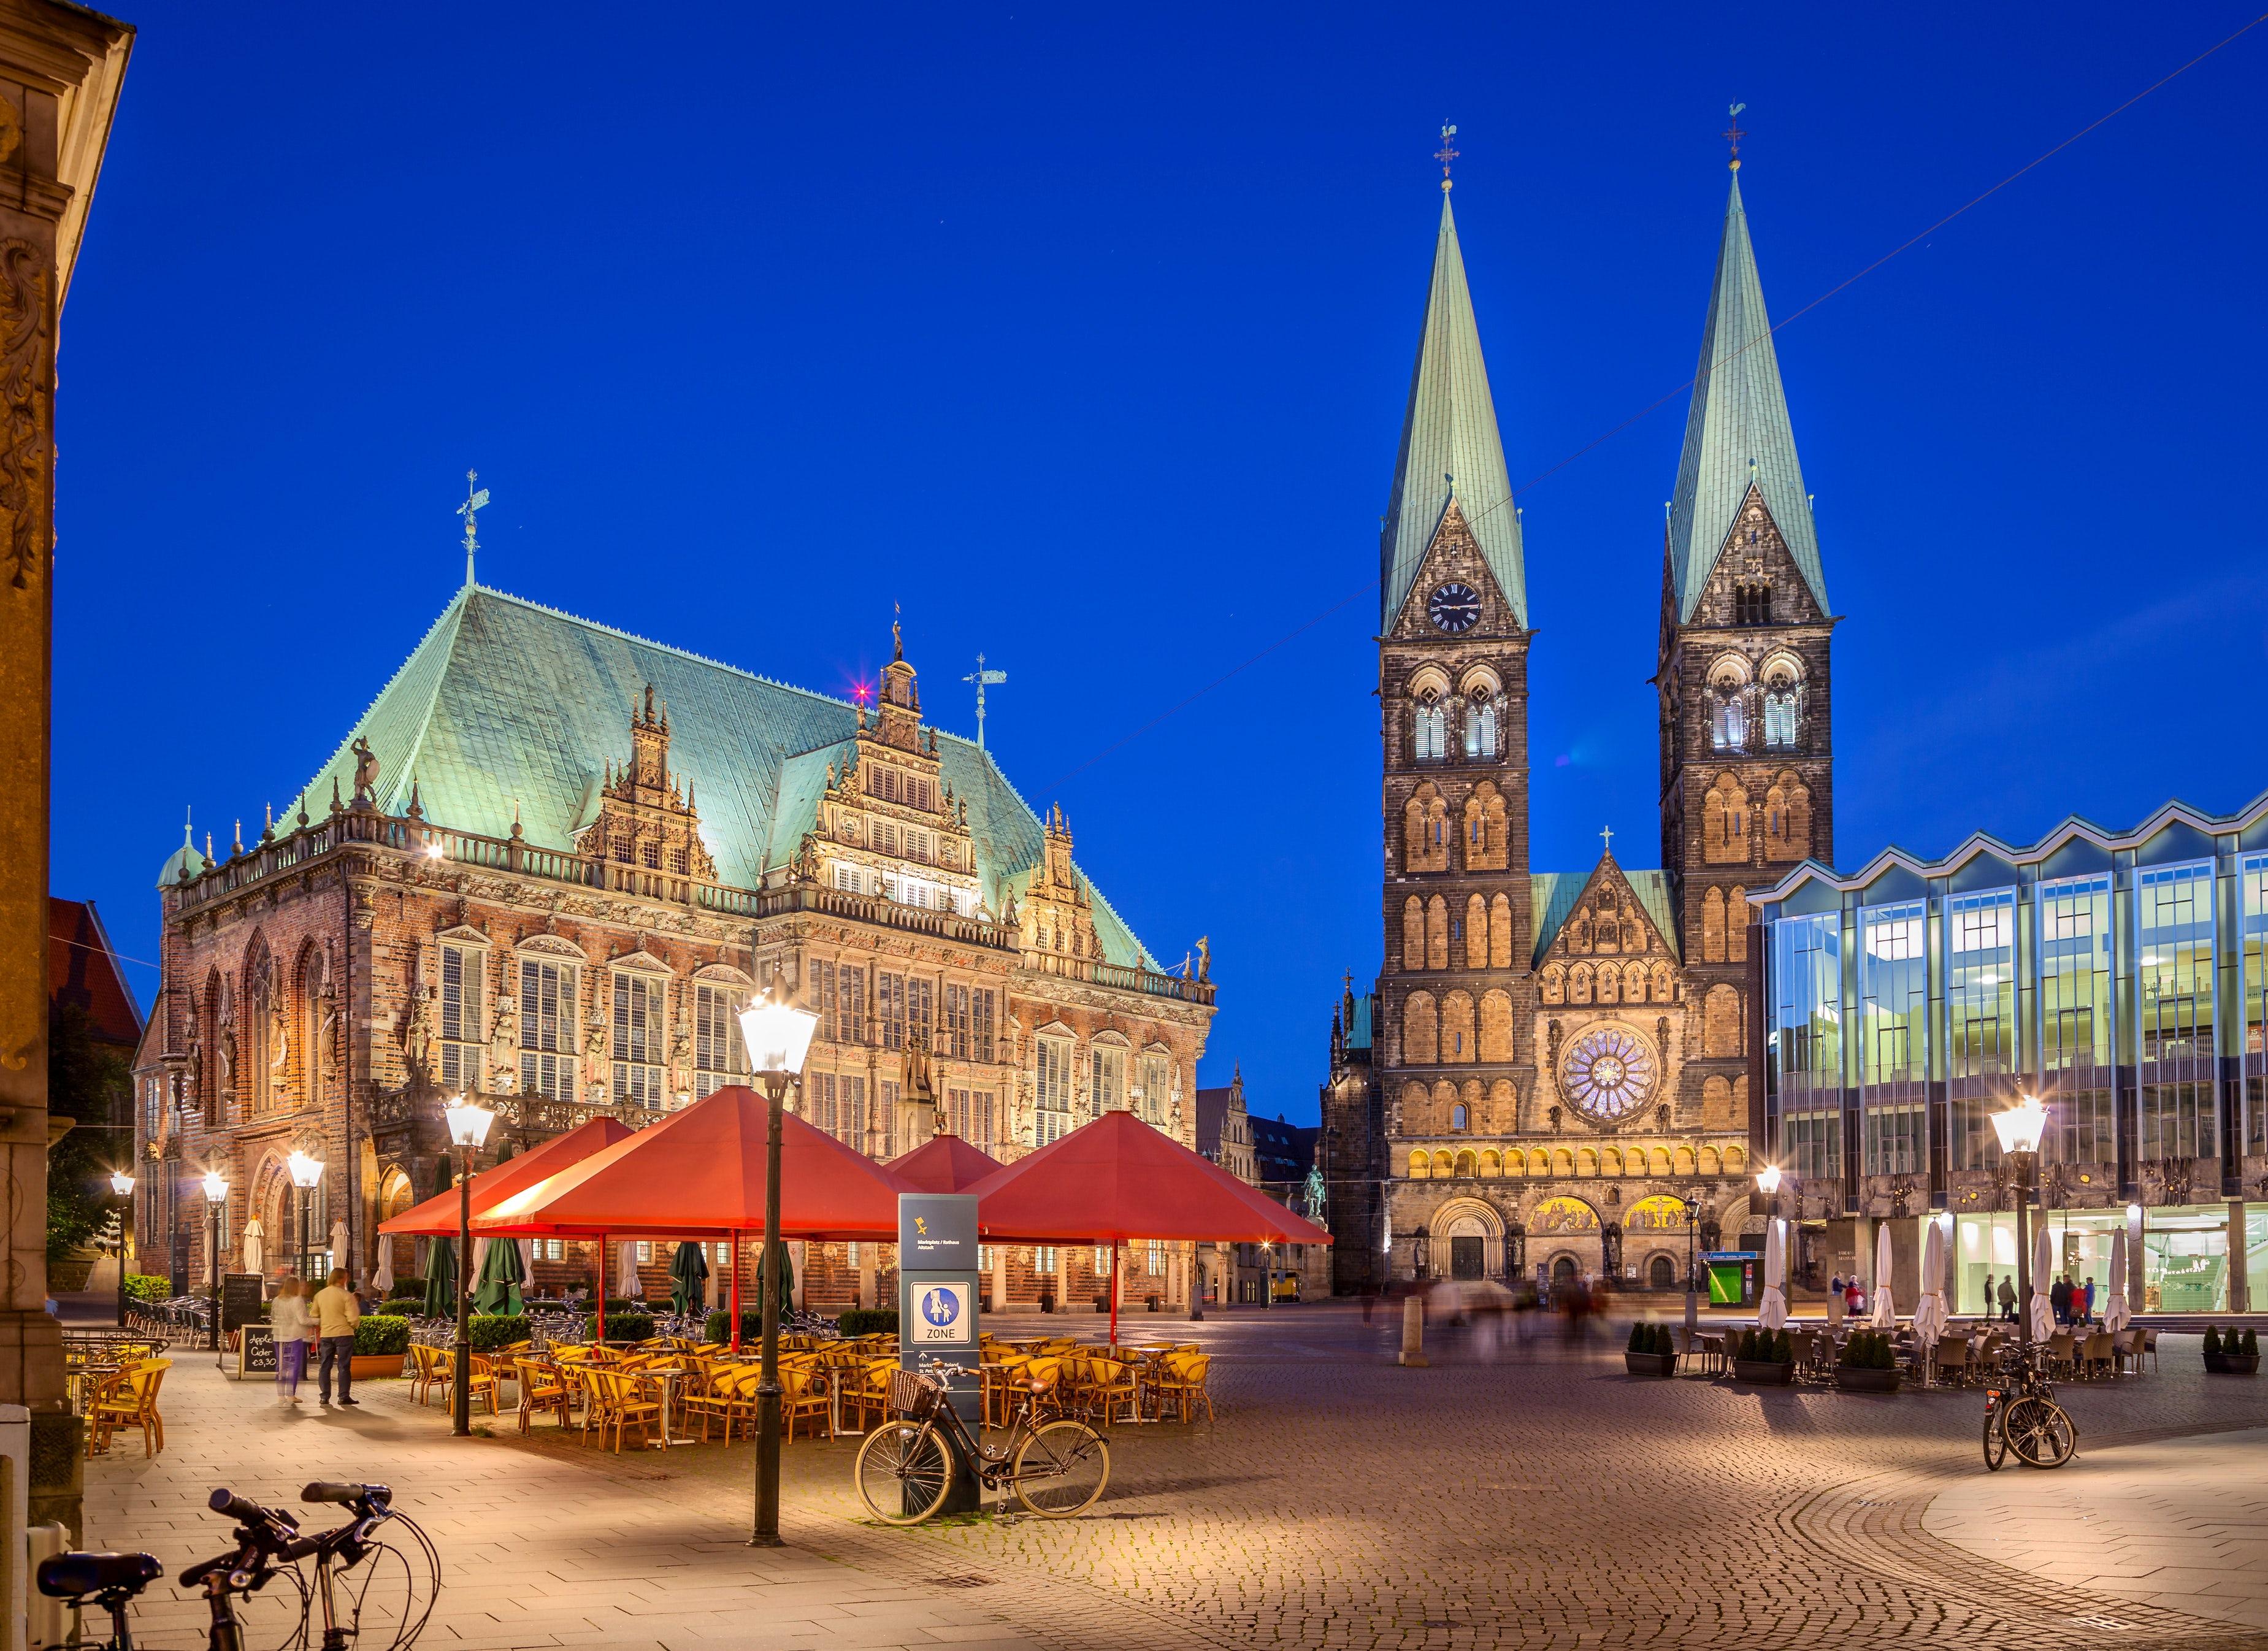 Bremen Rathaus and Dom St.Petri